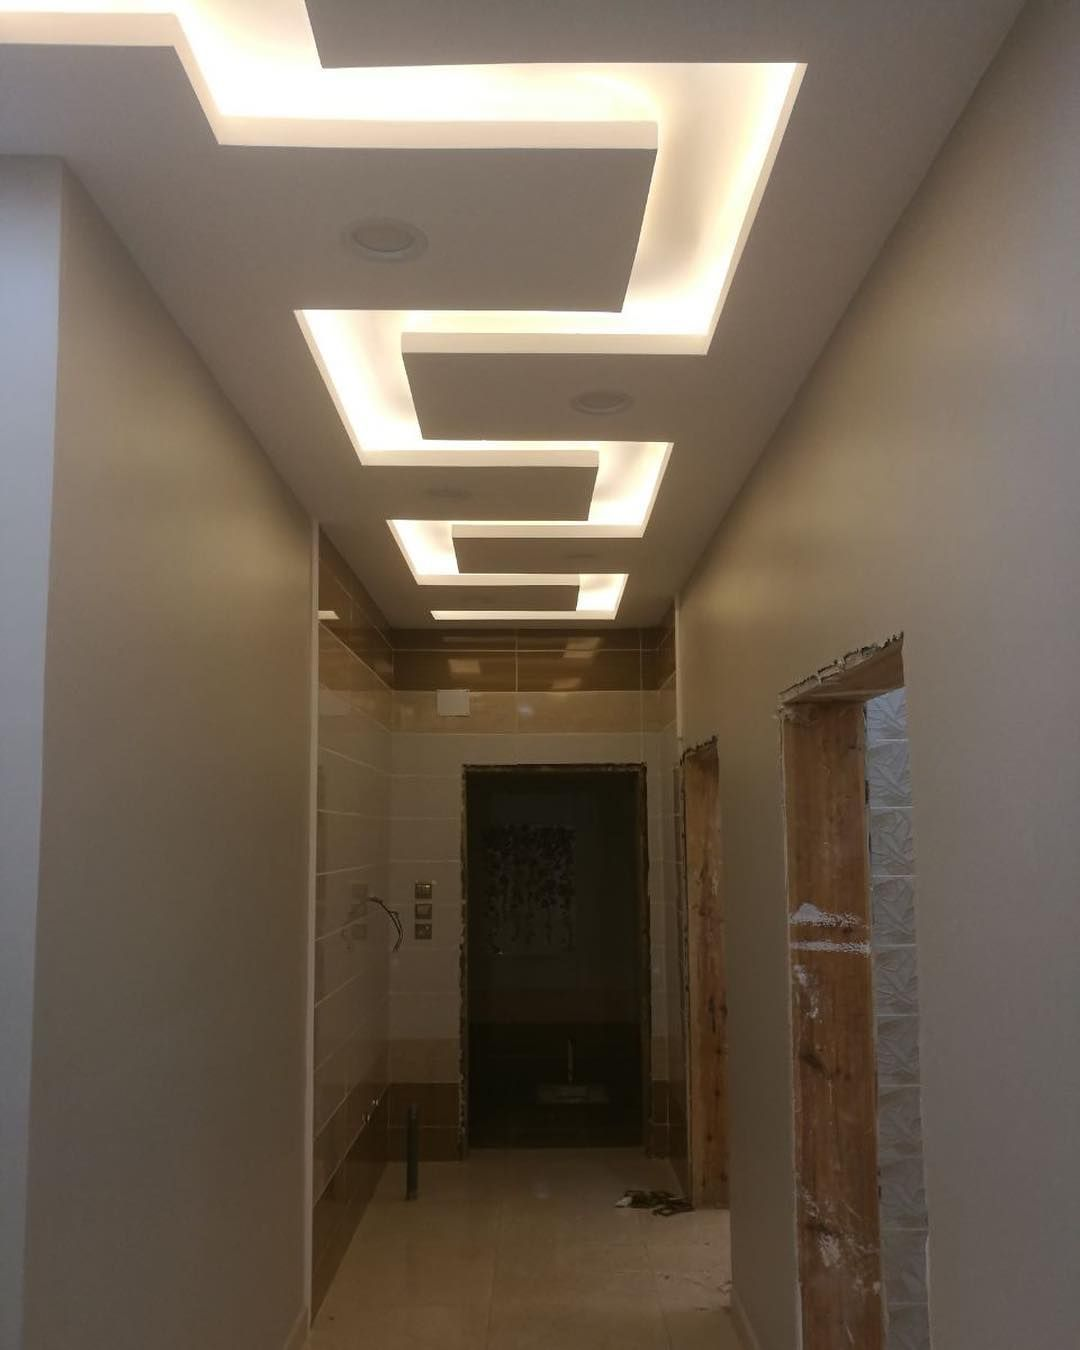 False ceiling for hall bedroom gypsum design also ideas designs rh pinterest